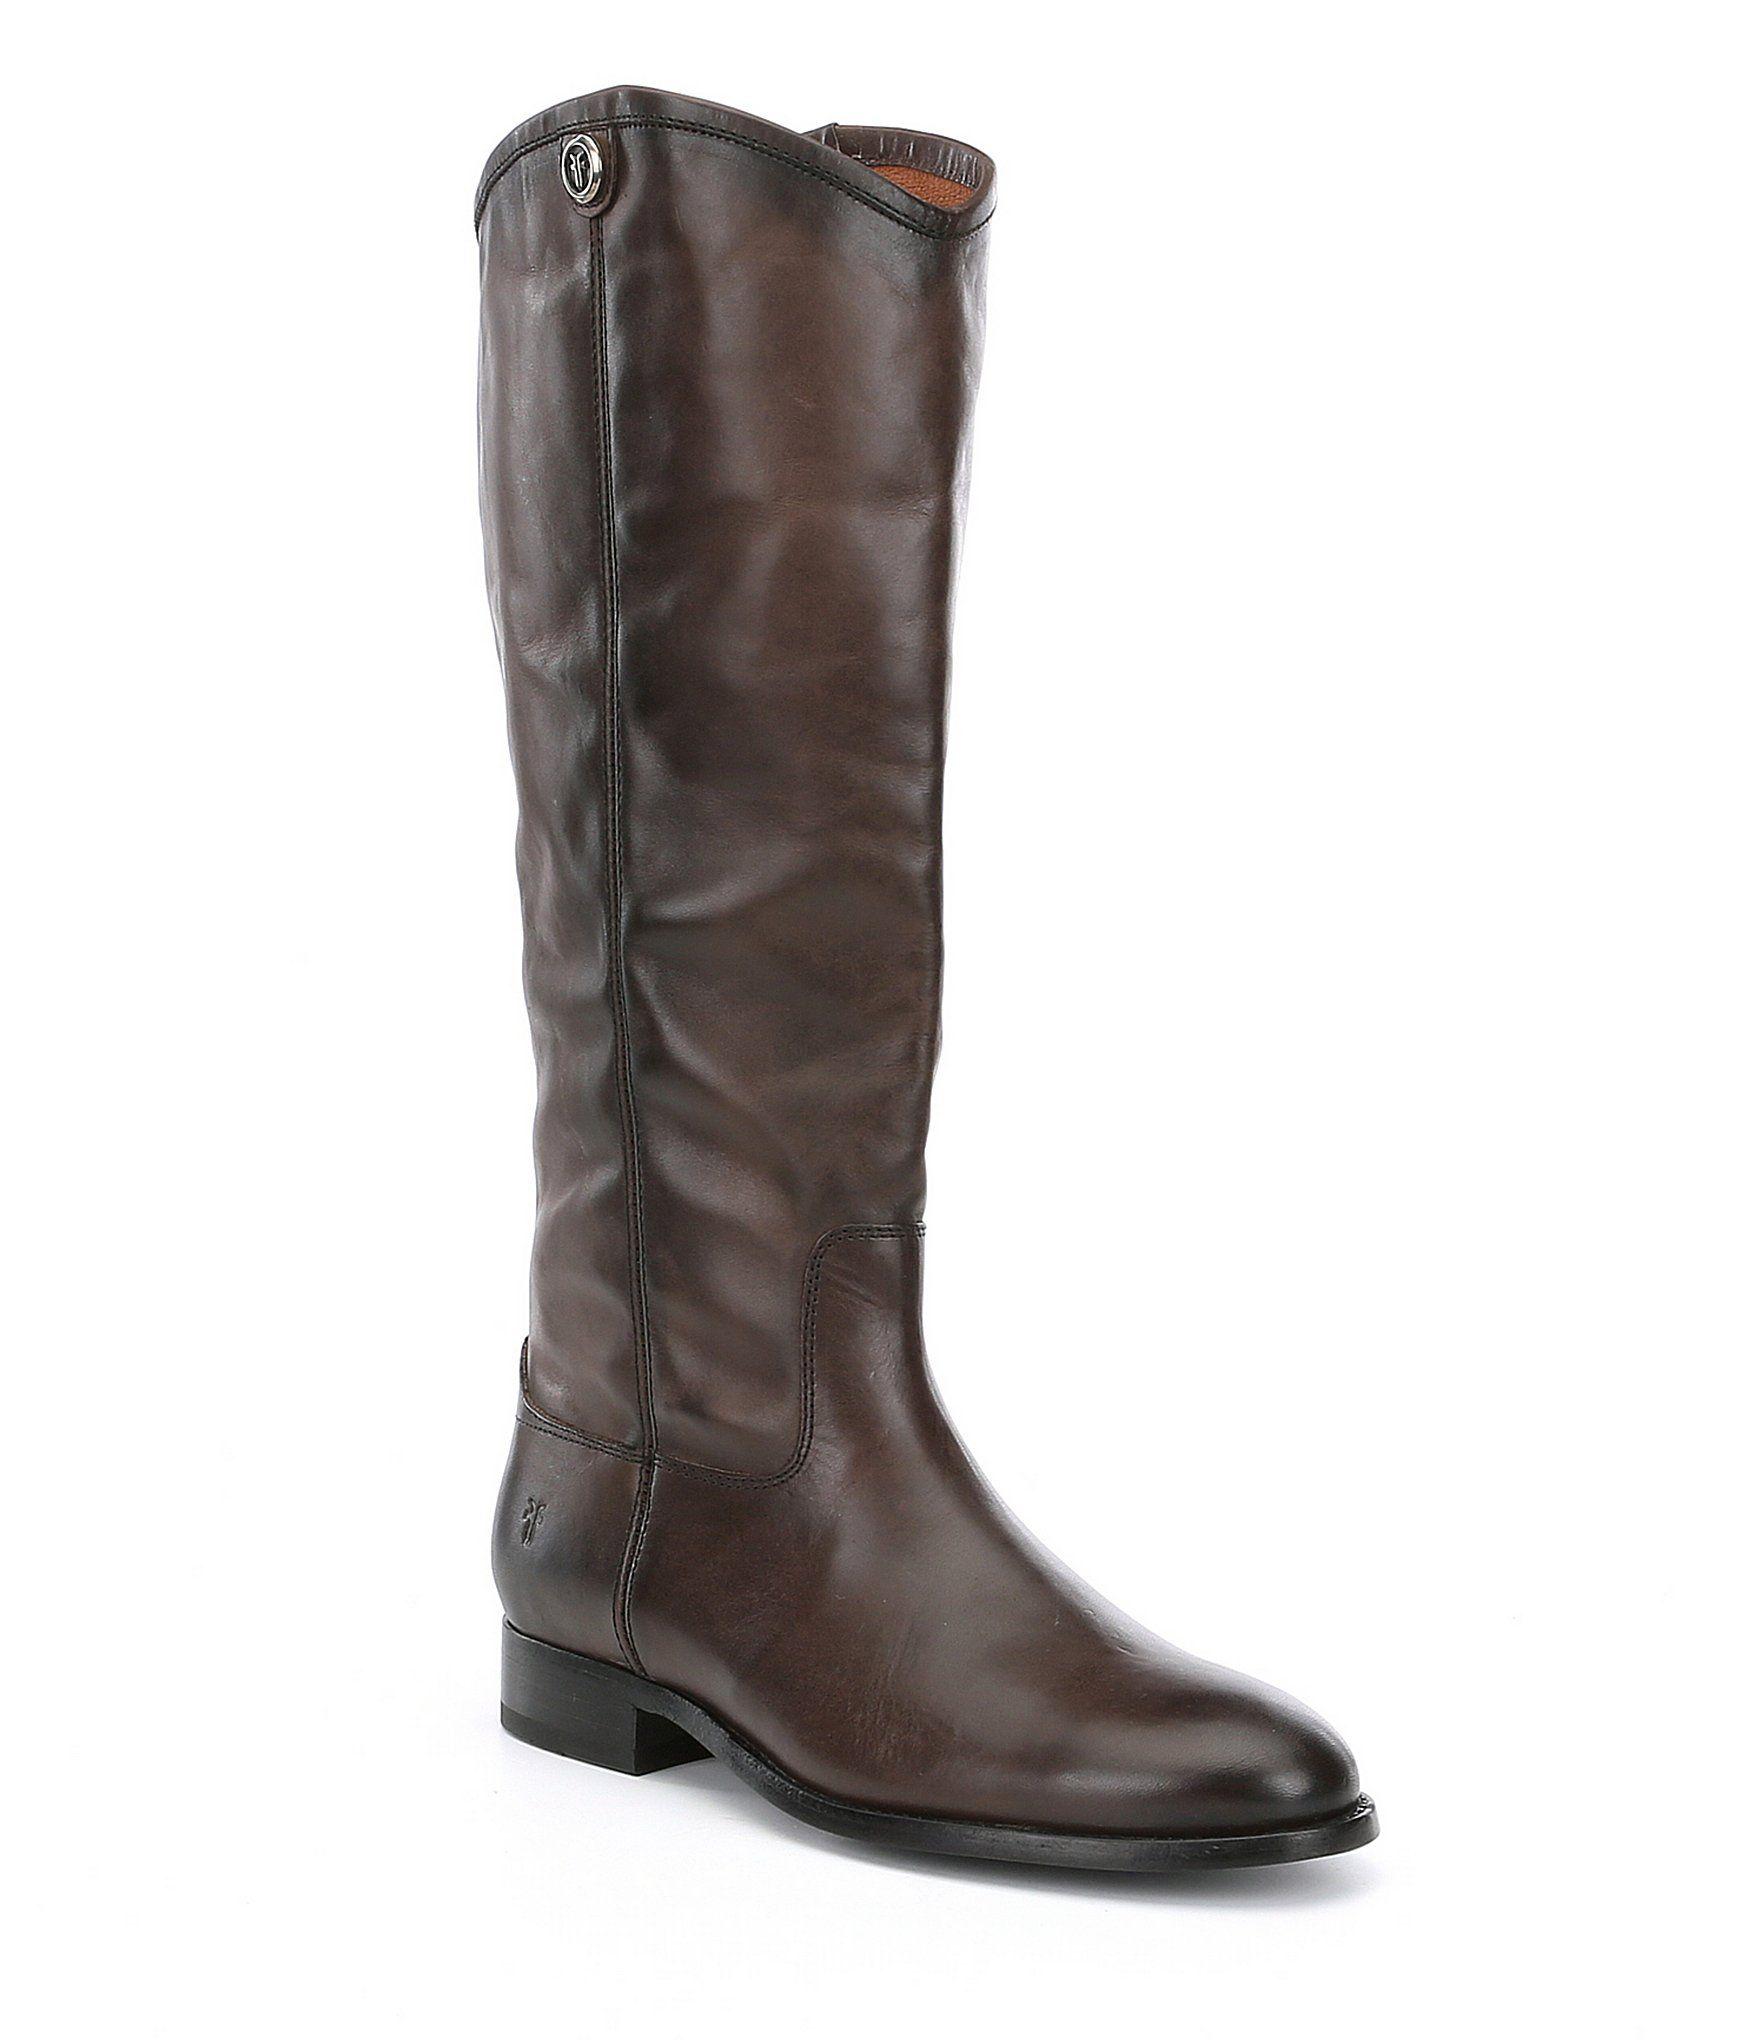 Frye Melissa Button 2 Tall Block Heel Riding Boots - Smoke 6.5M